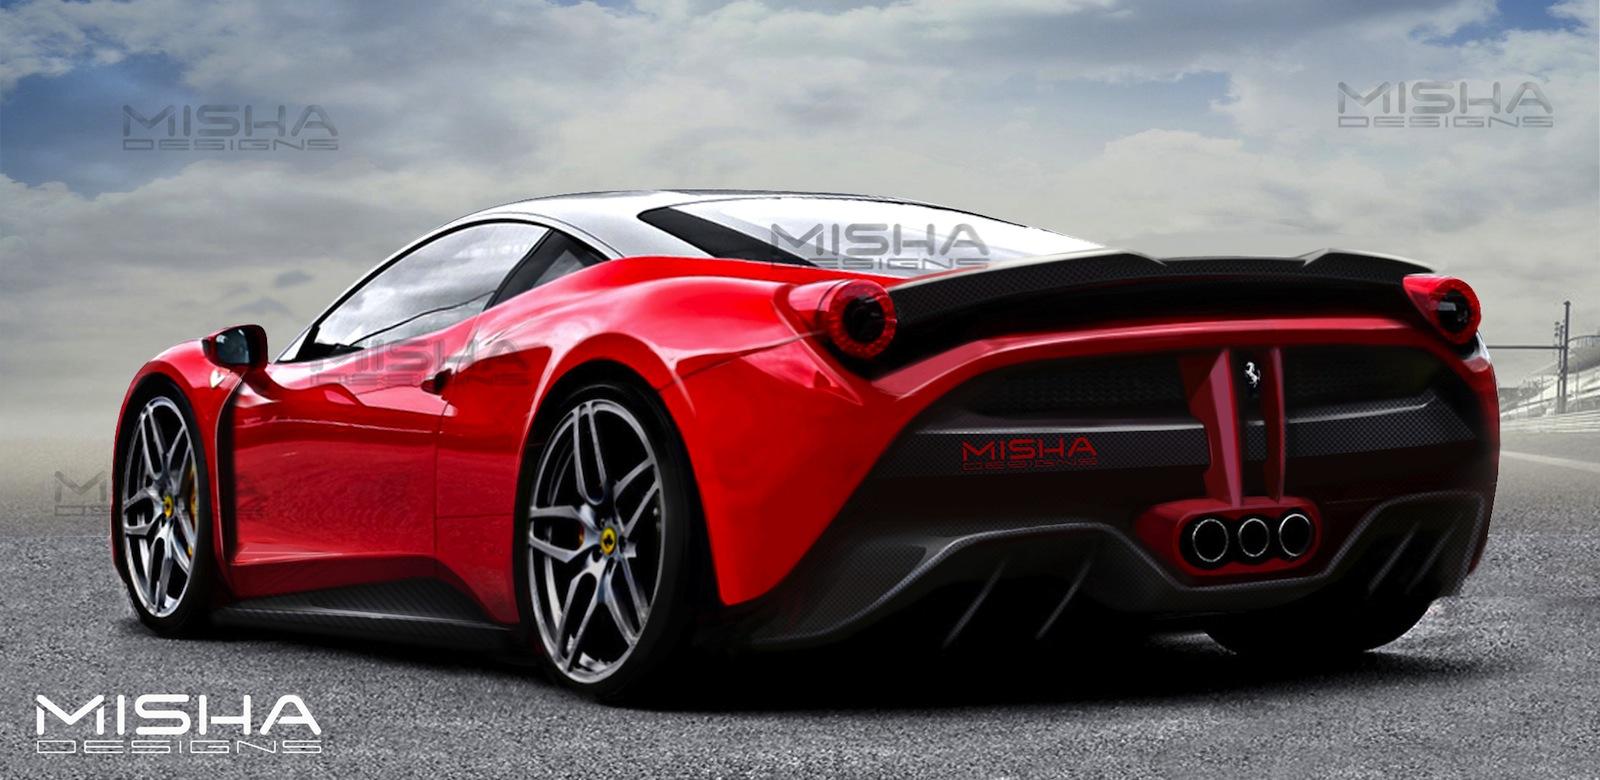 2018 ferrari fxx k. Beautiful Ferrari FXX KStyle Ferrari 458 By Misha Designs Rear Quarter And 2018 Ferrari Fxx K